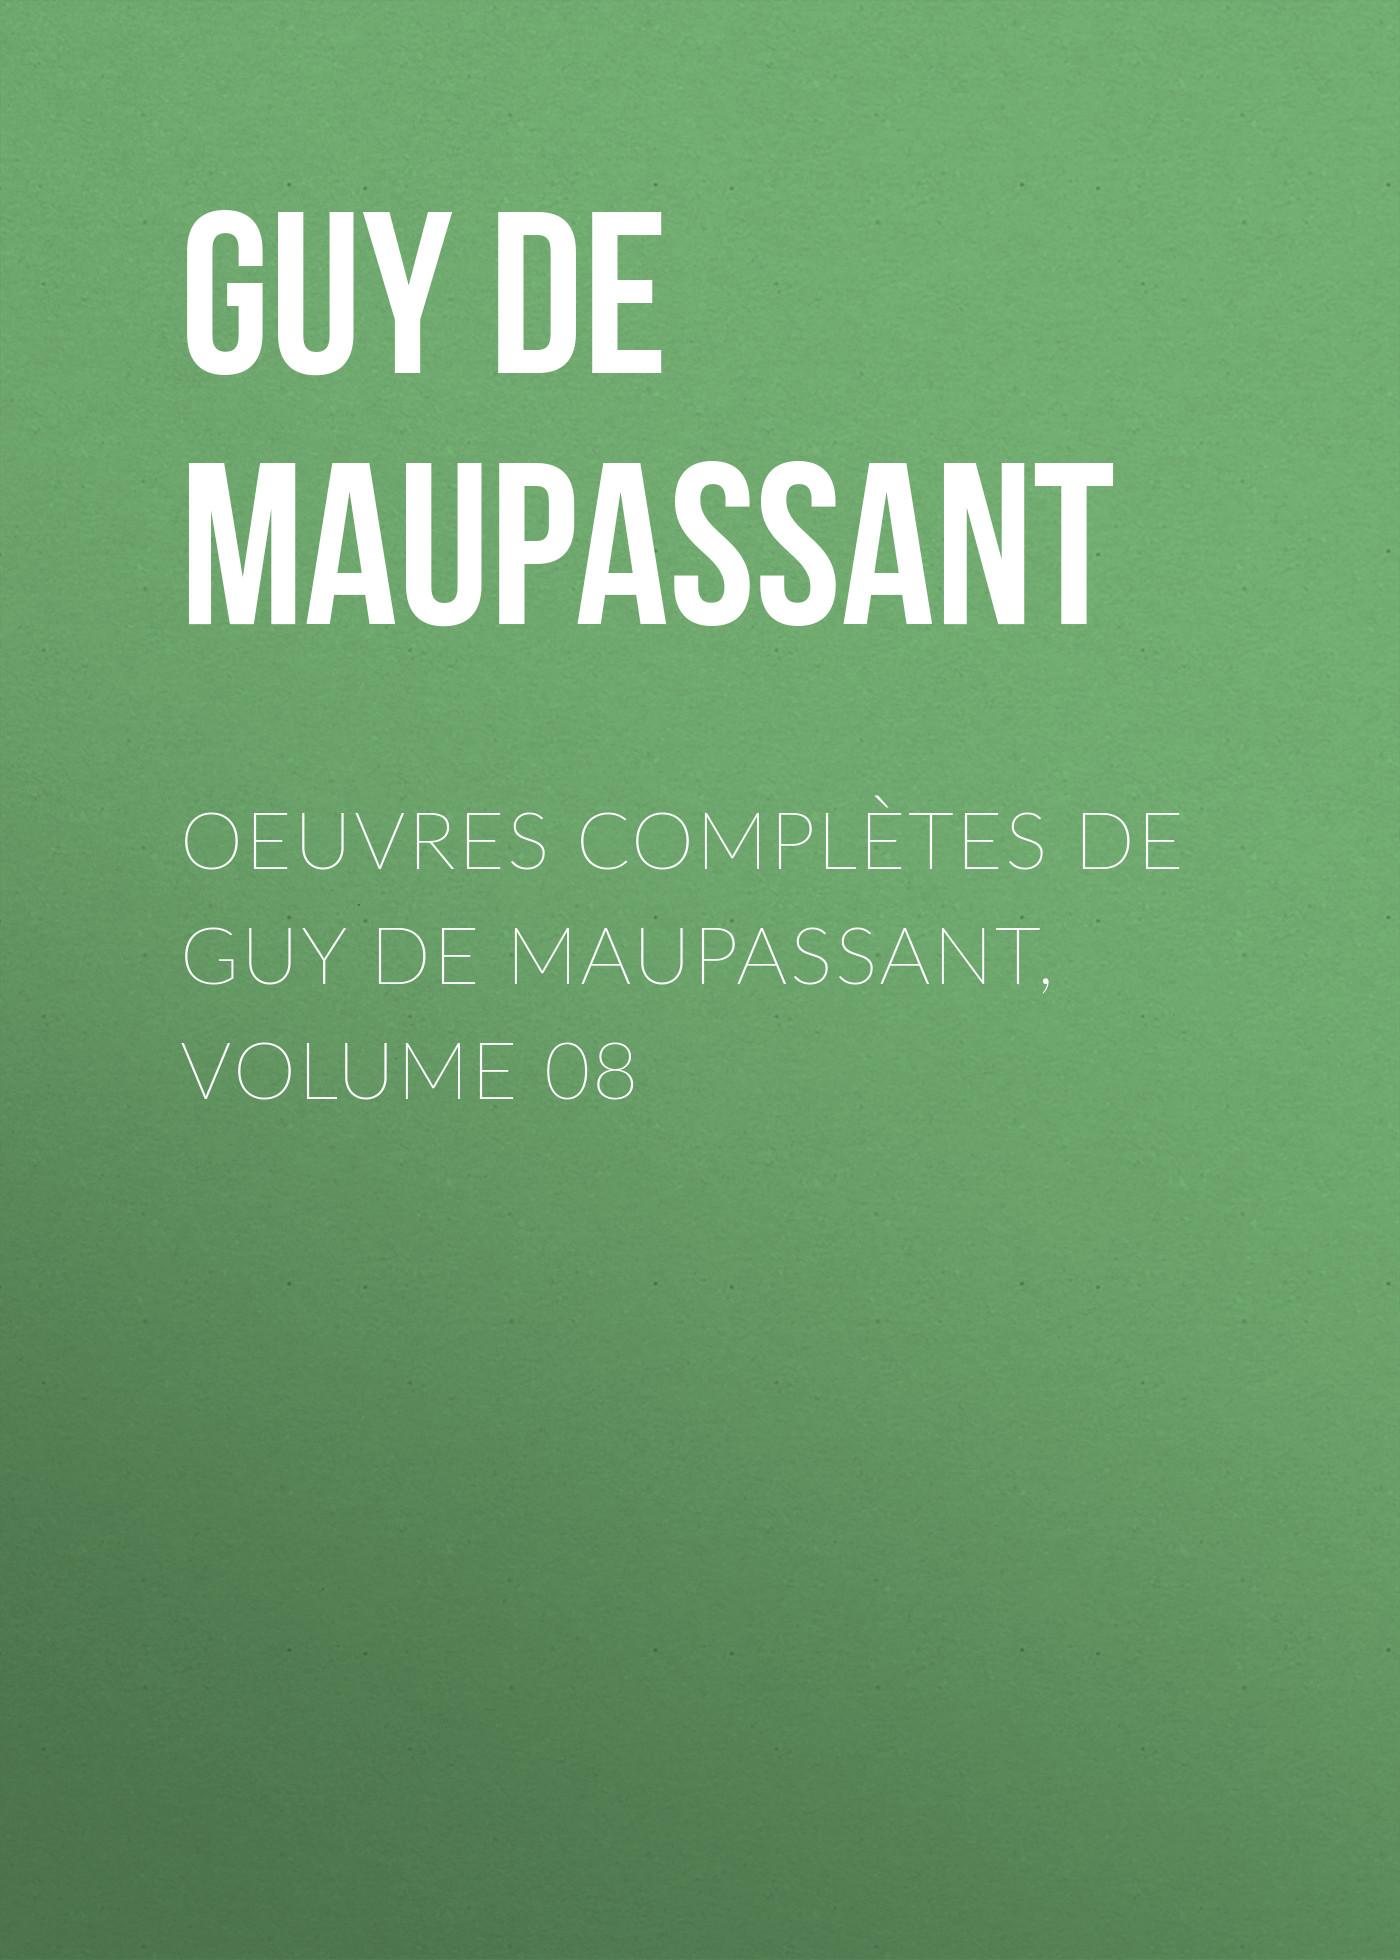 Ги де Мопассан Oeuvres complètes de Guy de Maupassant, volume 08 ги де мопассан œuvres complètes de guy de maupassant volume 03